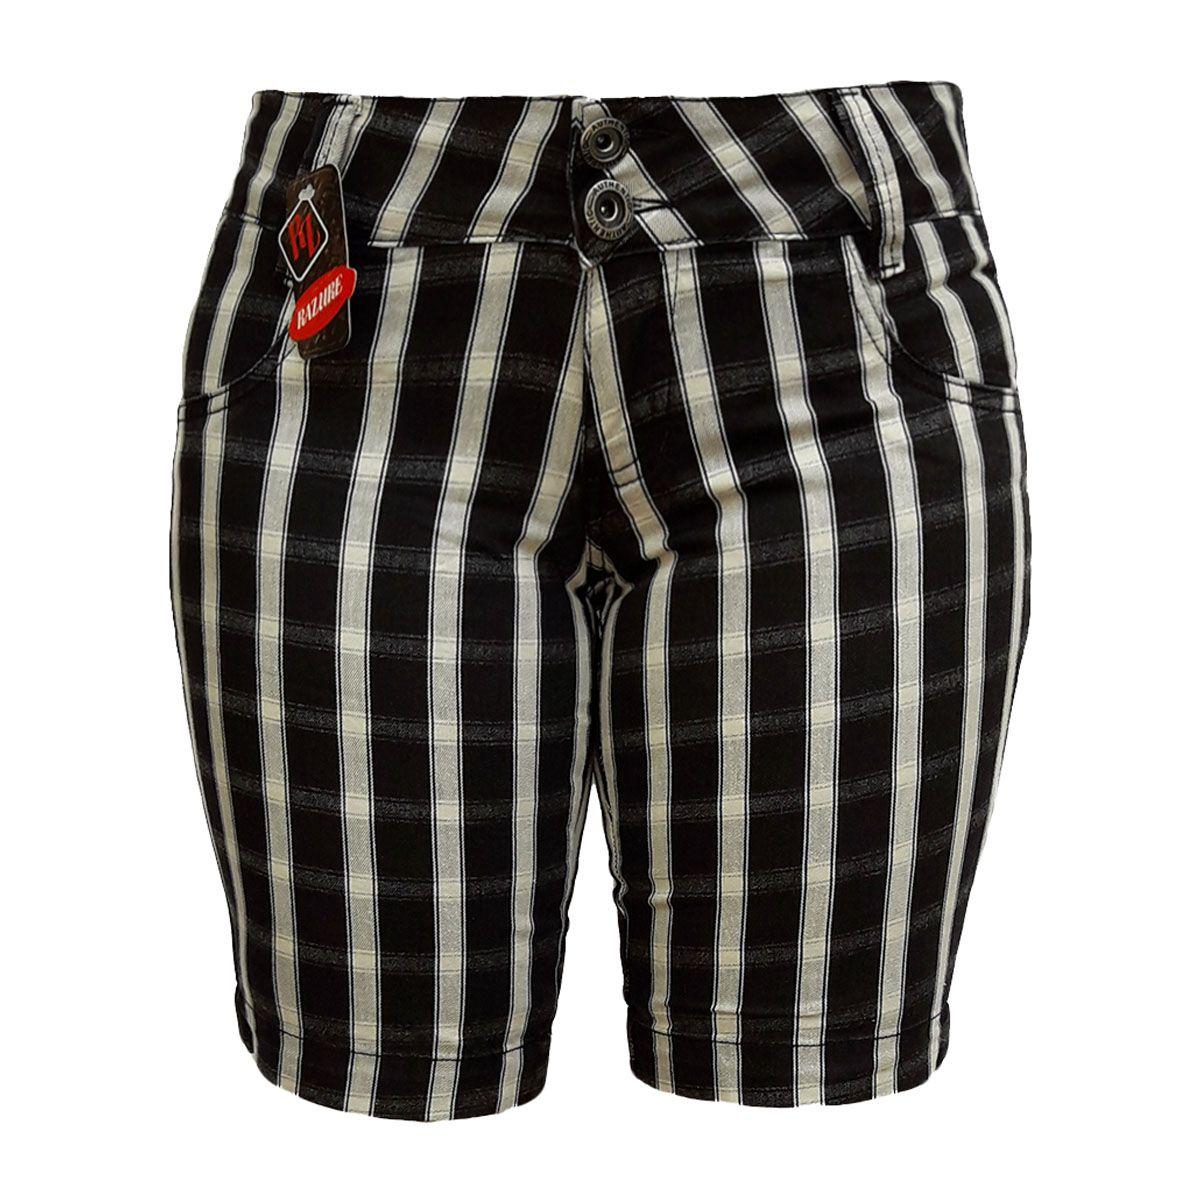 Bermuda Jeans Feminina Xadrez Cintura Baixa Tamanho 38